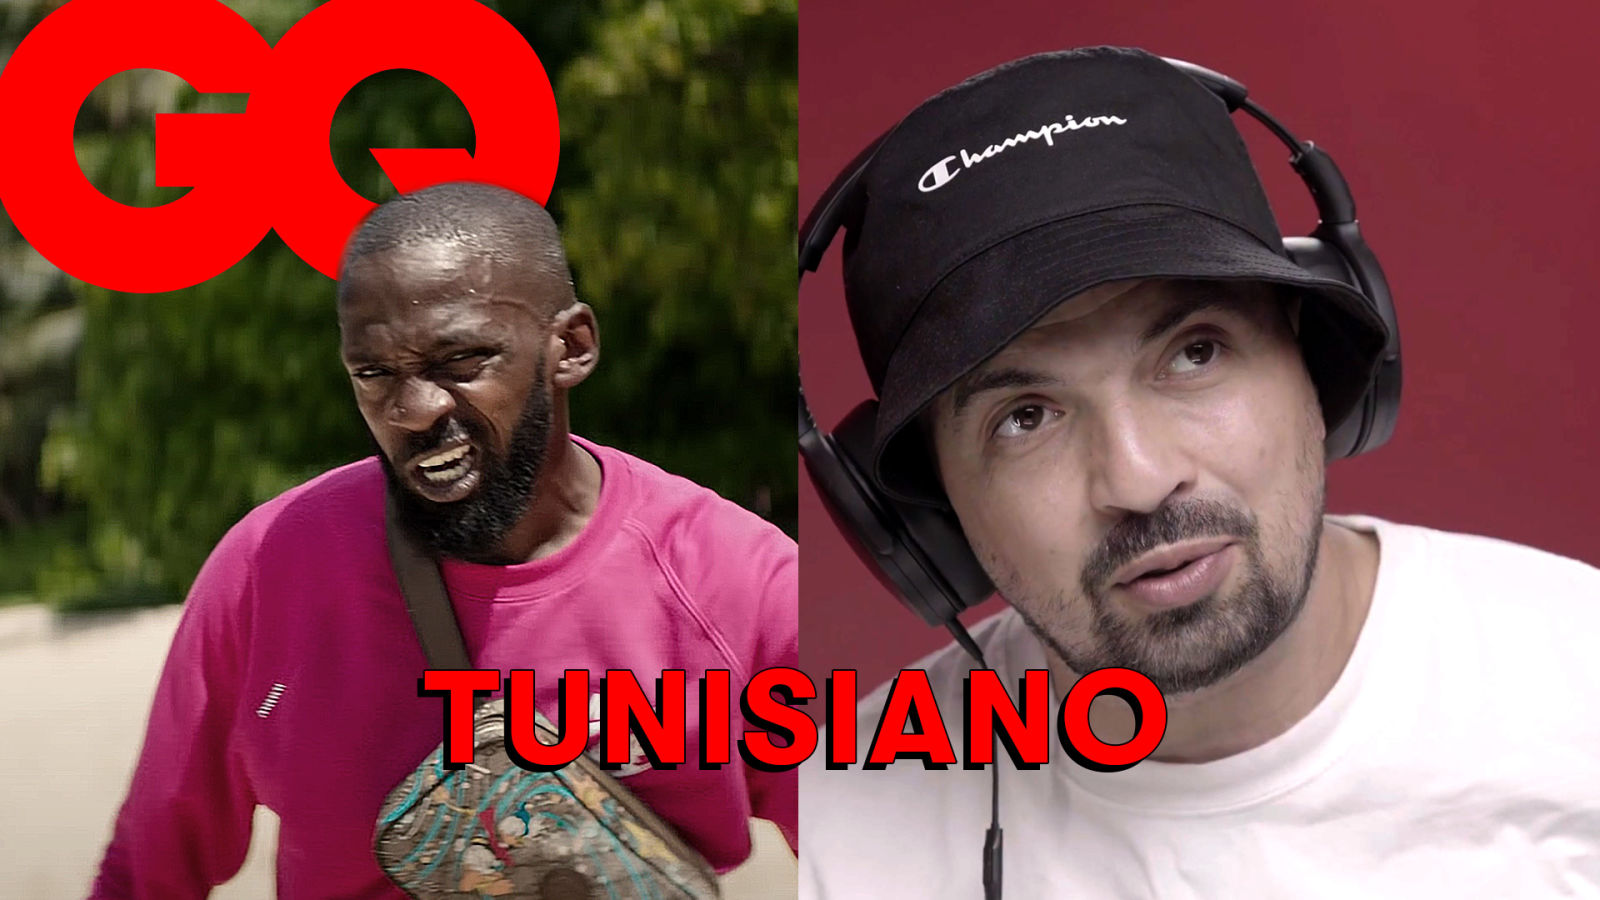 Tunisiano juge le rap français : Booba, DA Uzi, Naps